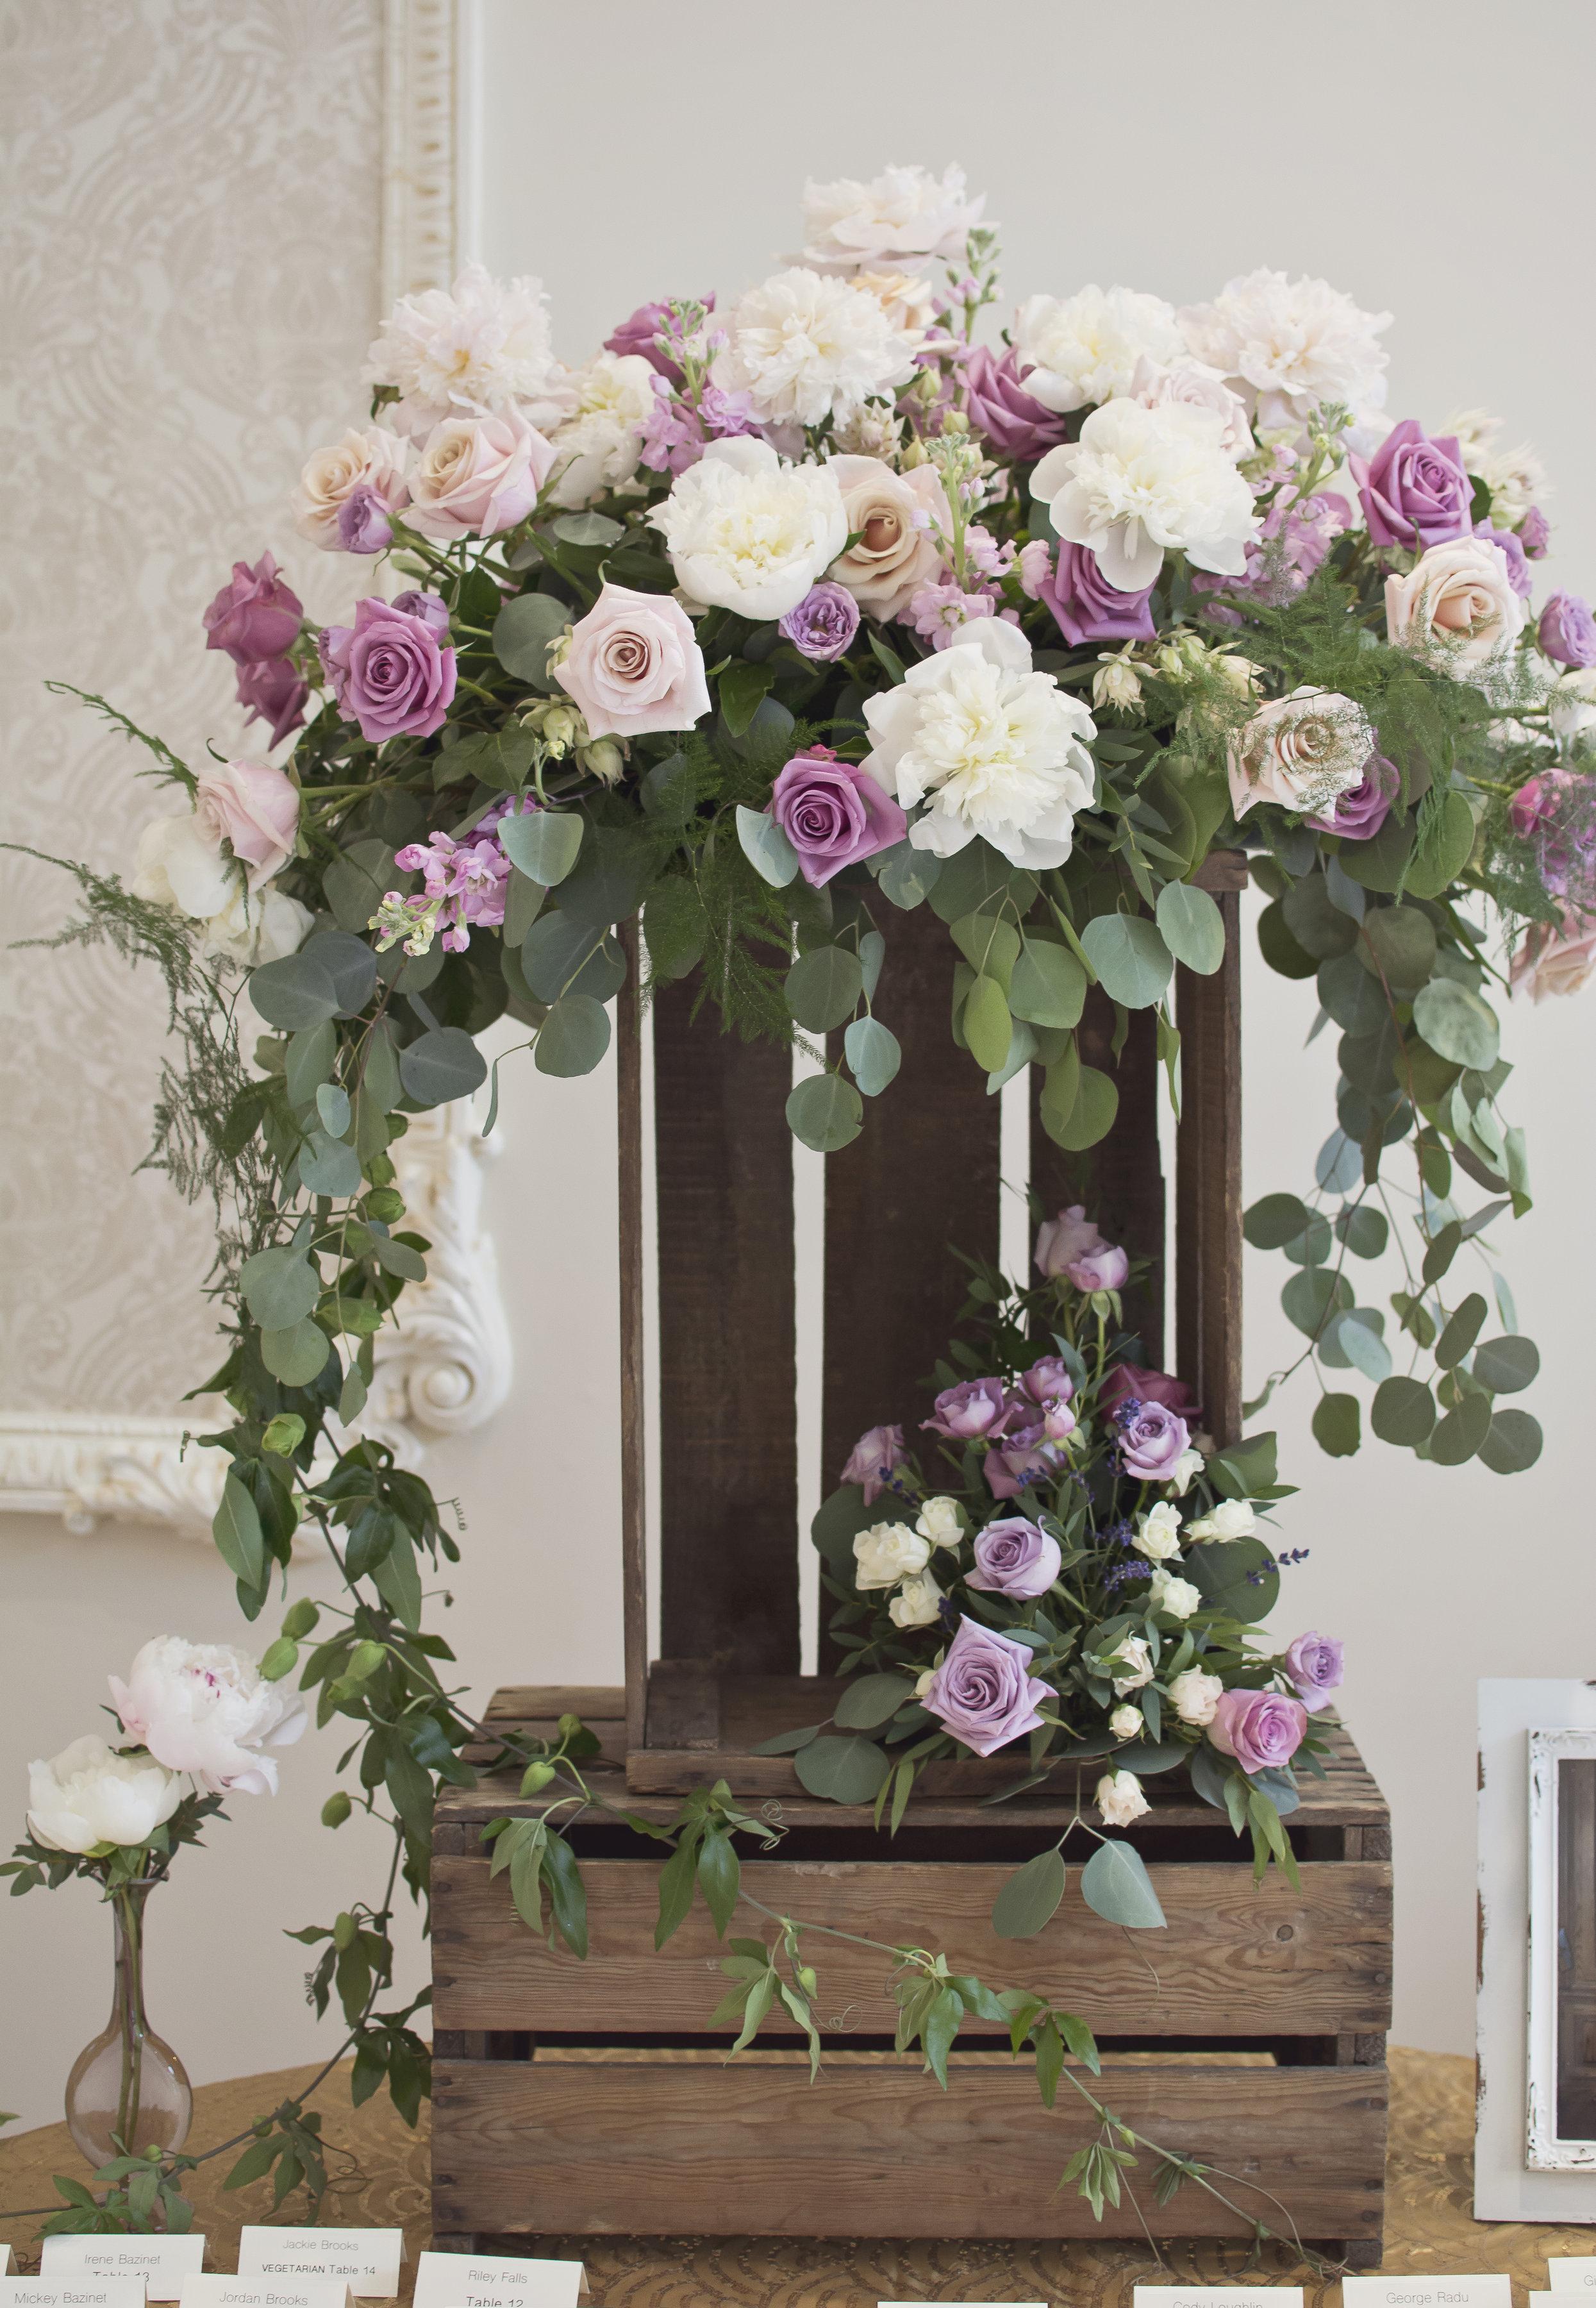 Aspen Florist Guest Book Florals